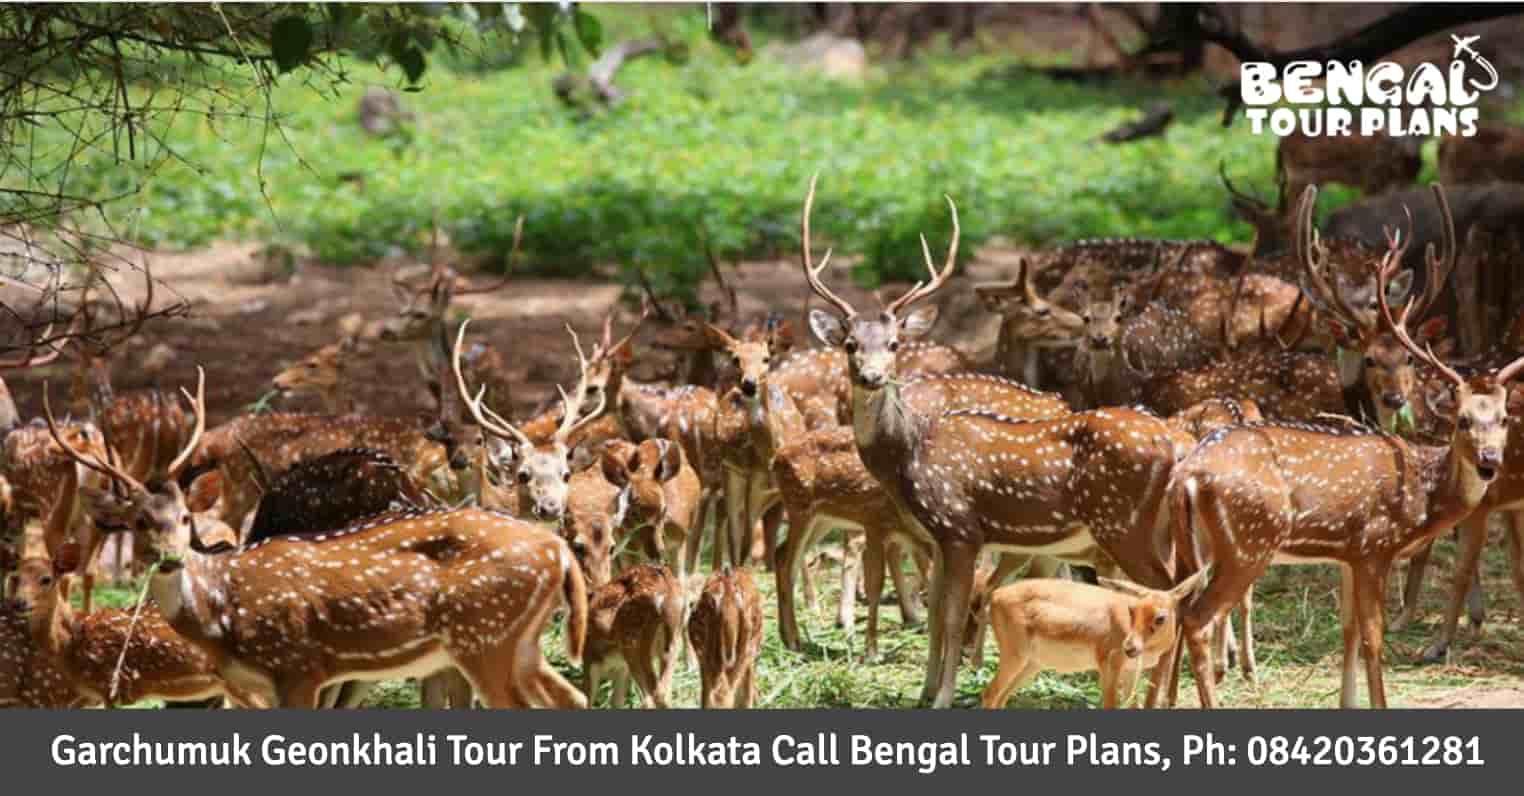 Garchumuk Geonkhali Tour Package From Kolkata